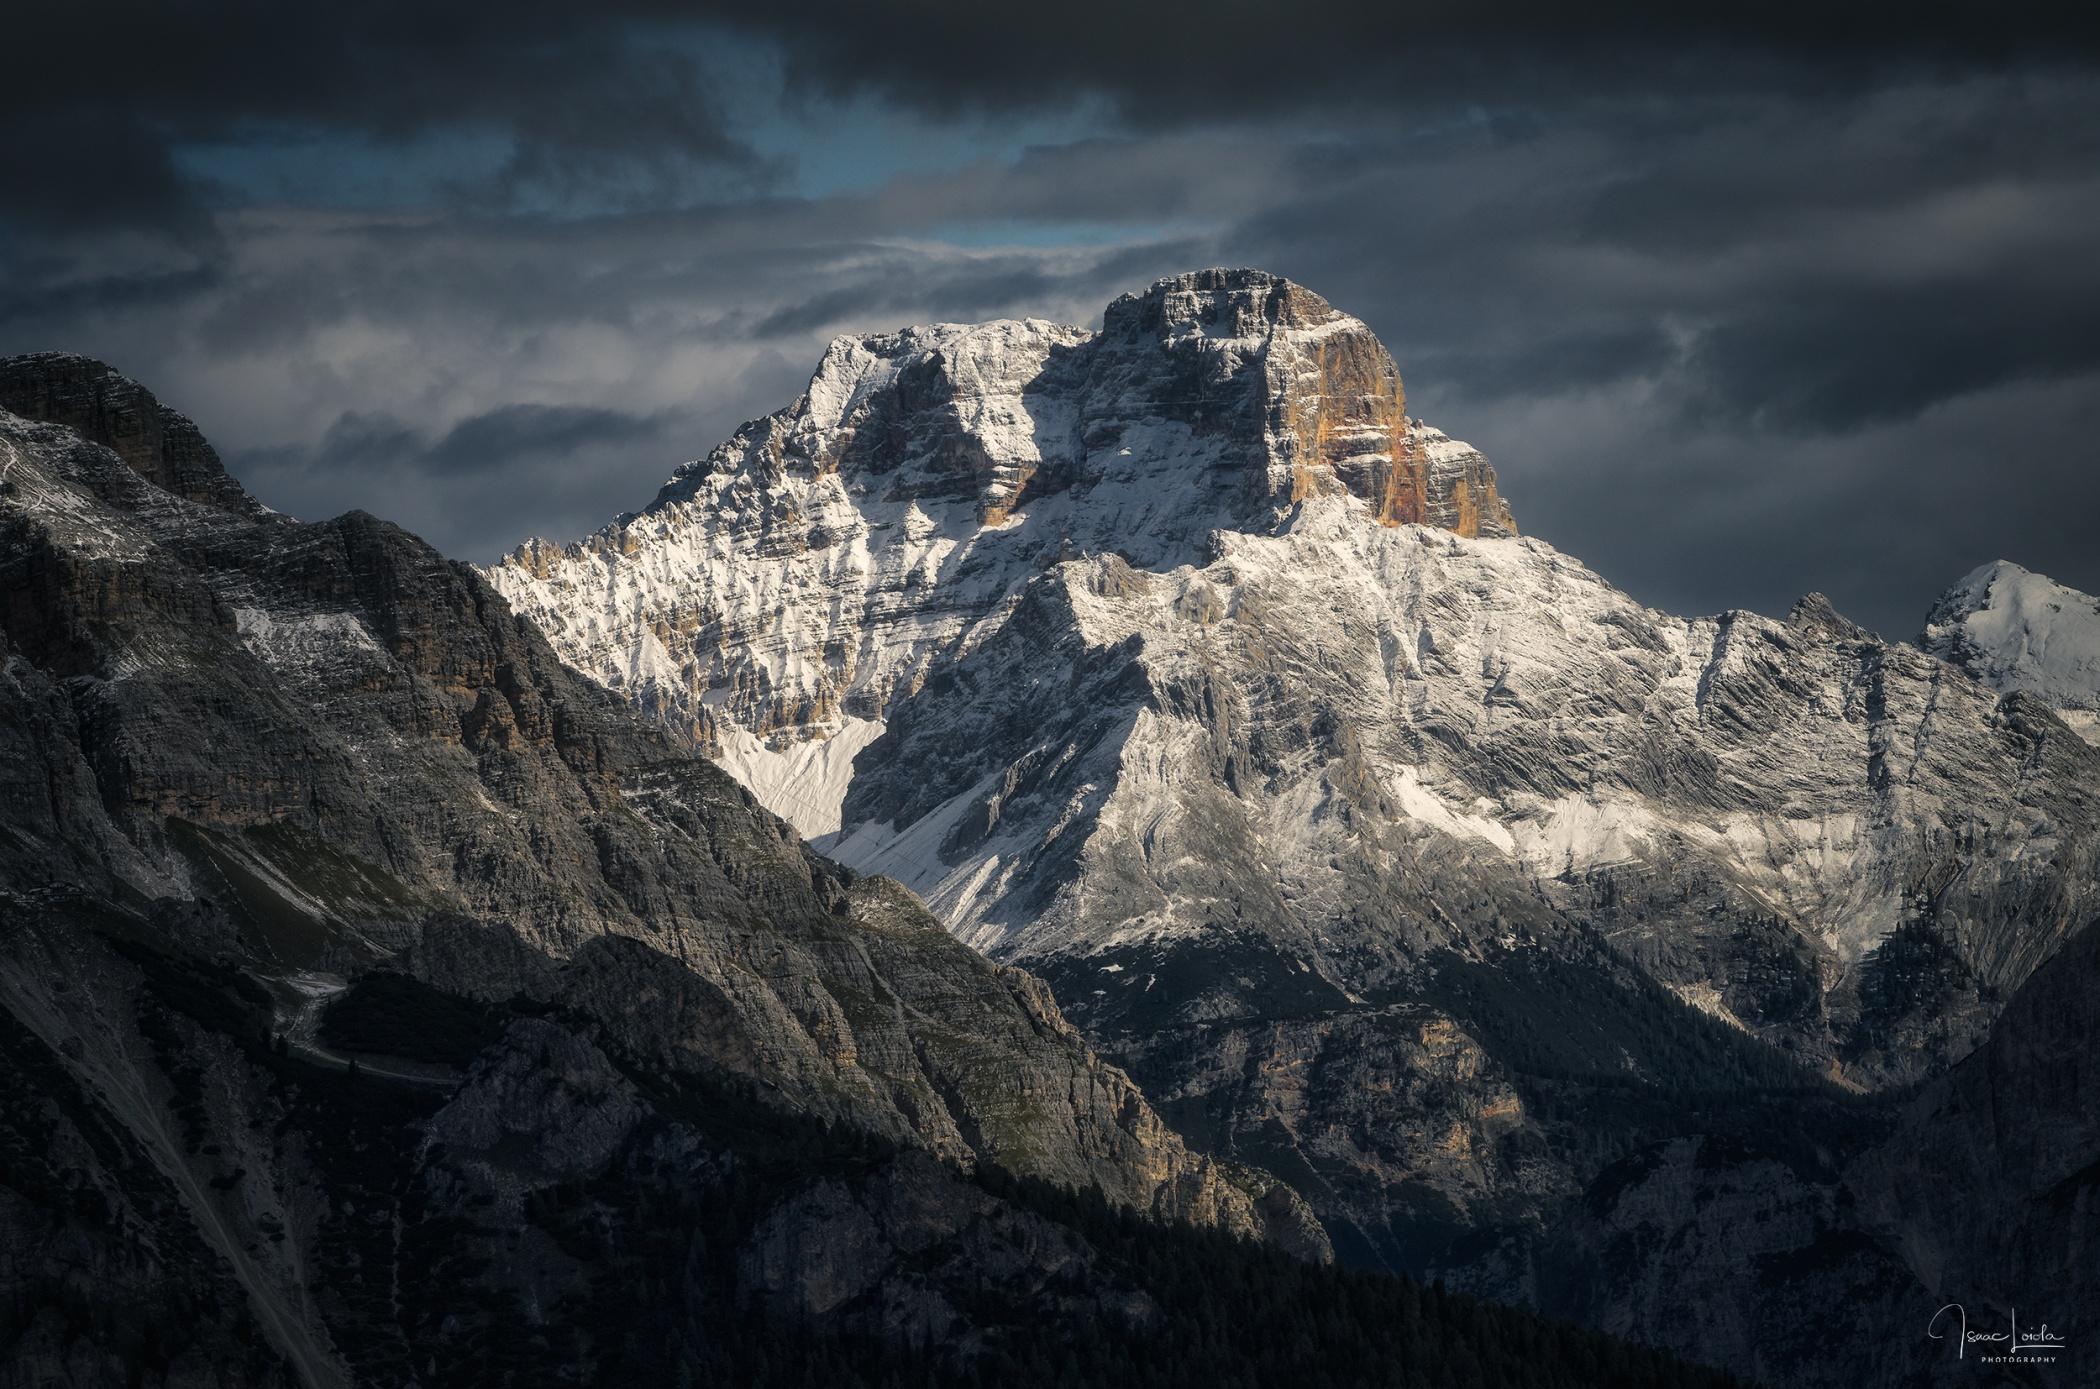 Croda Rossa - Mountain lights - Isaac Loiola, Photography